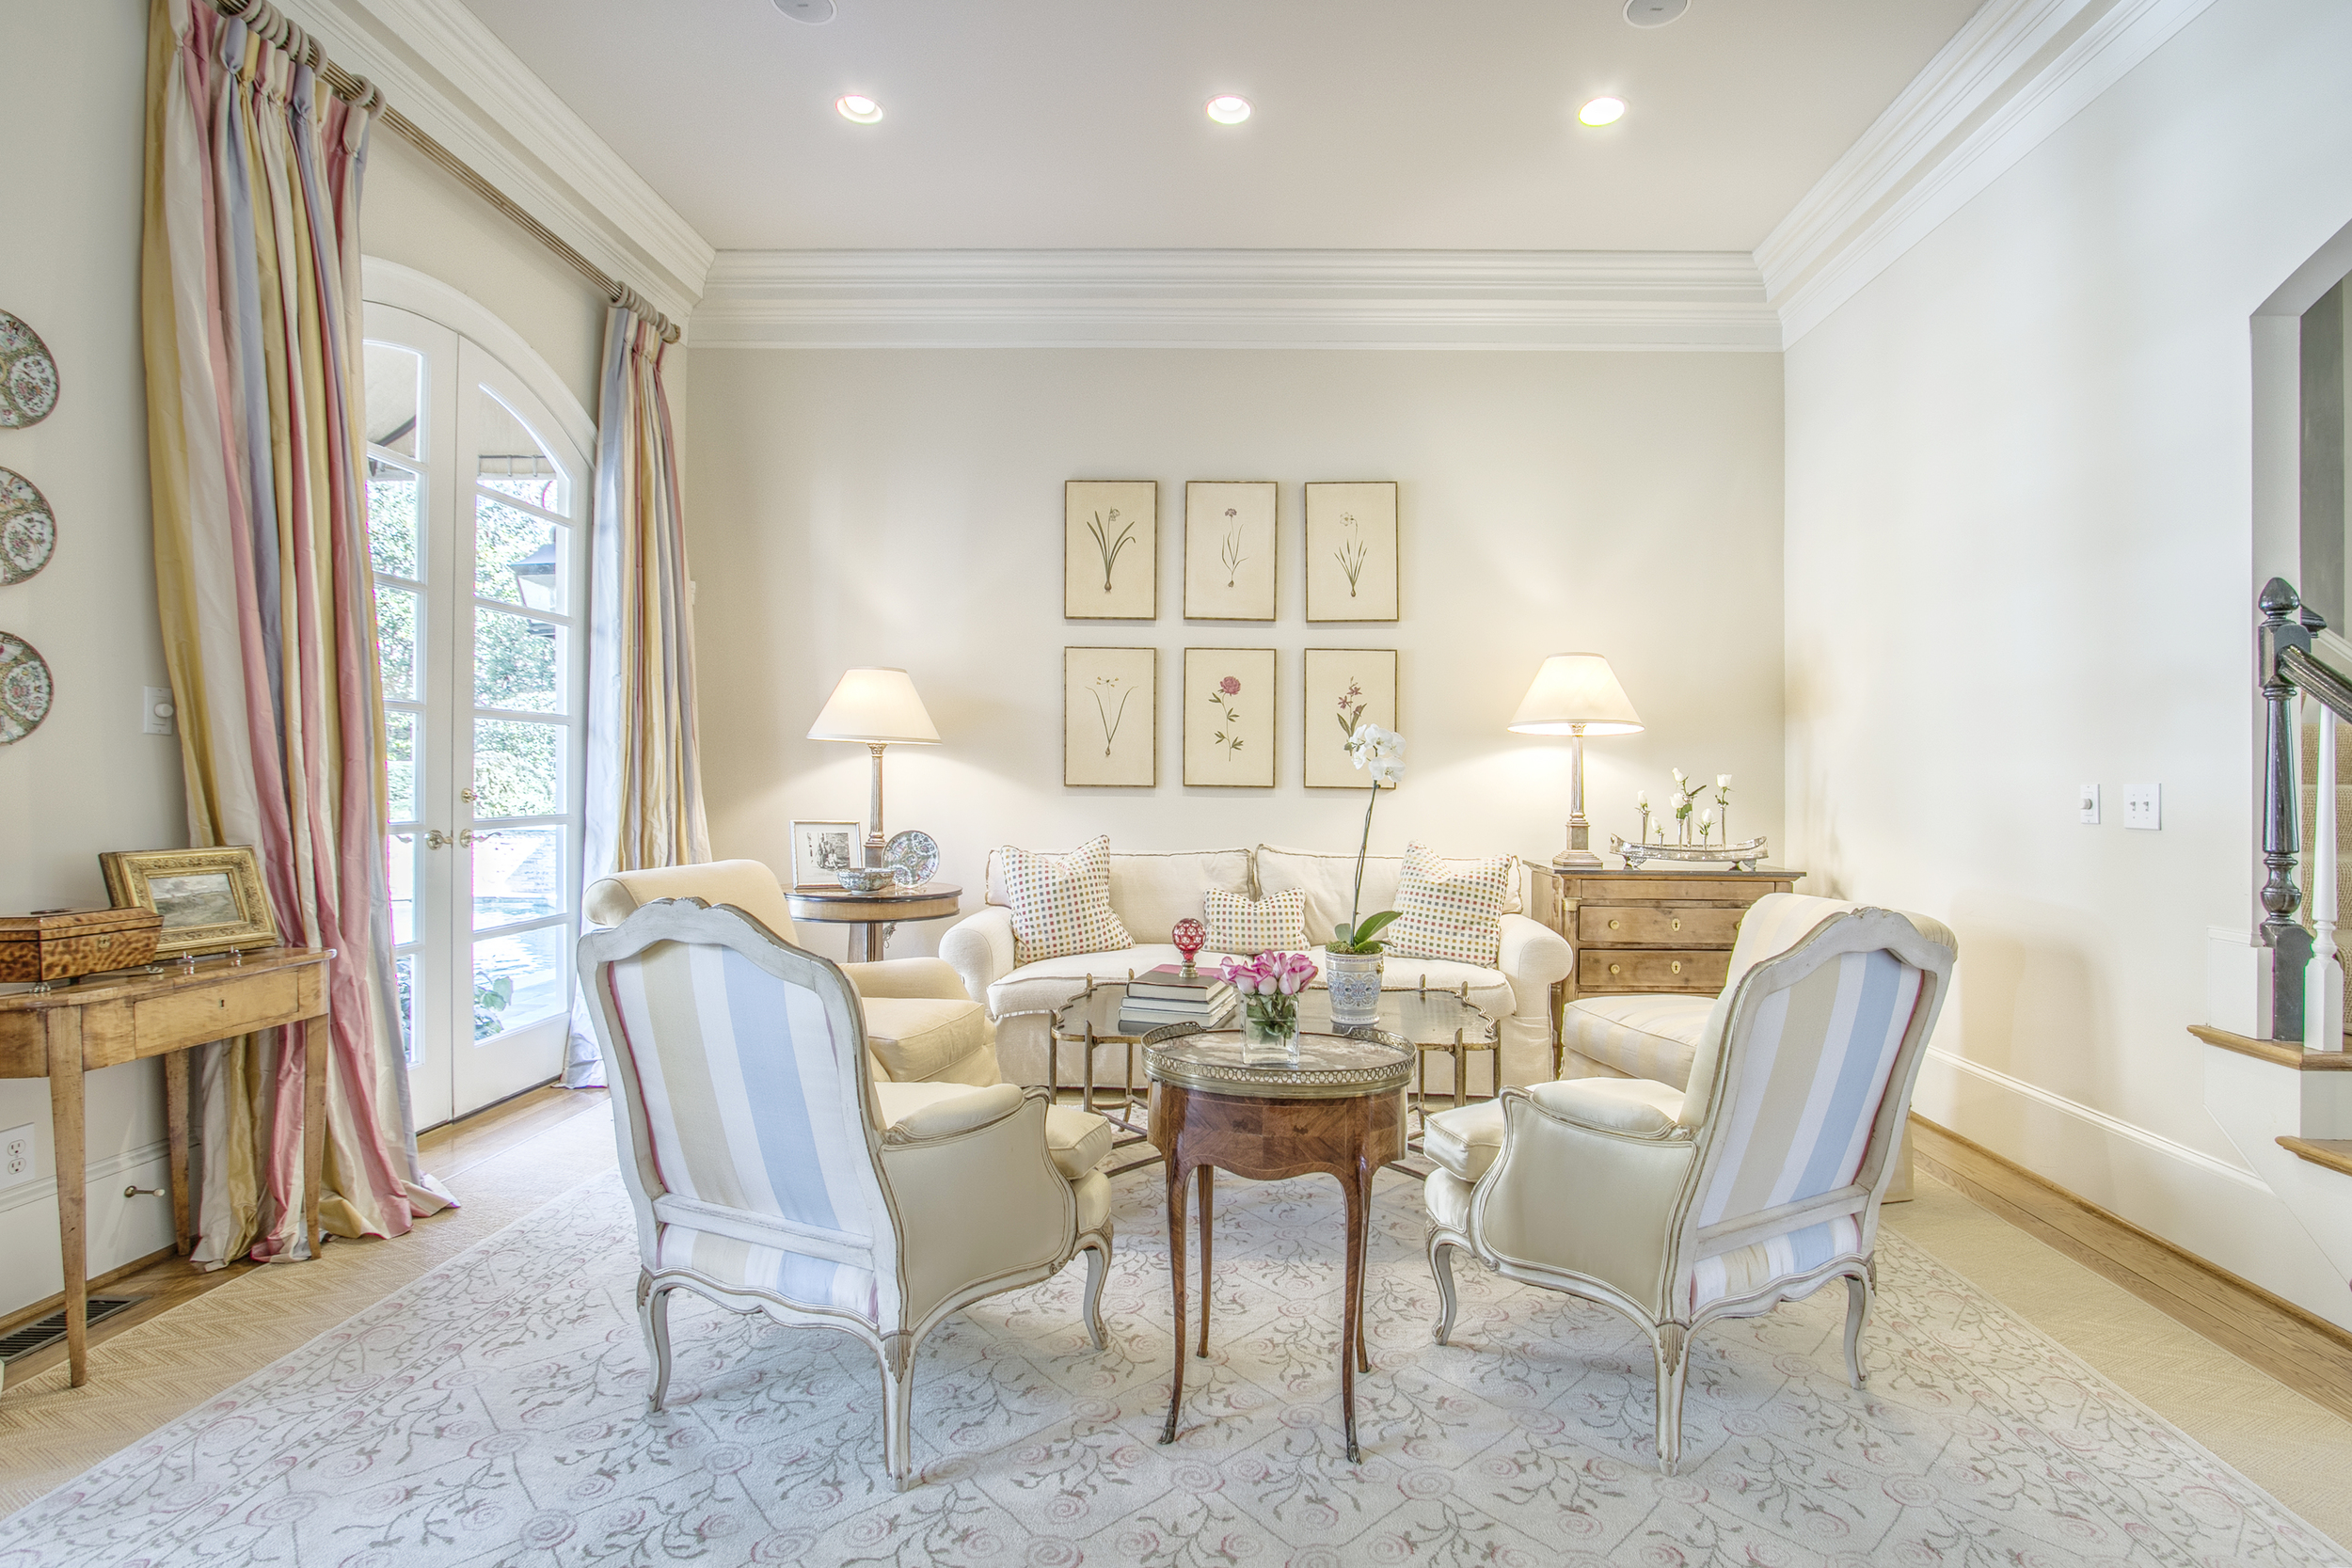 Framed photos in the formal living room